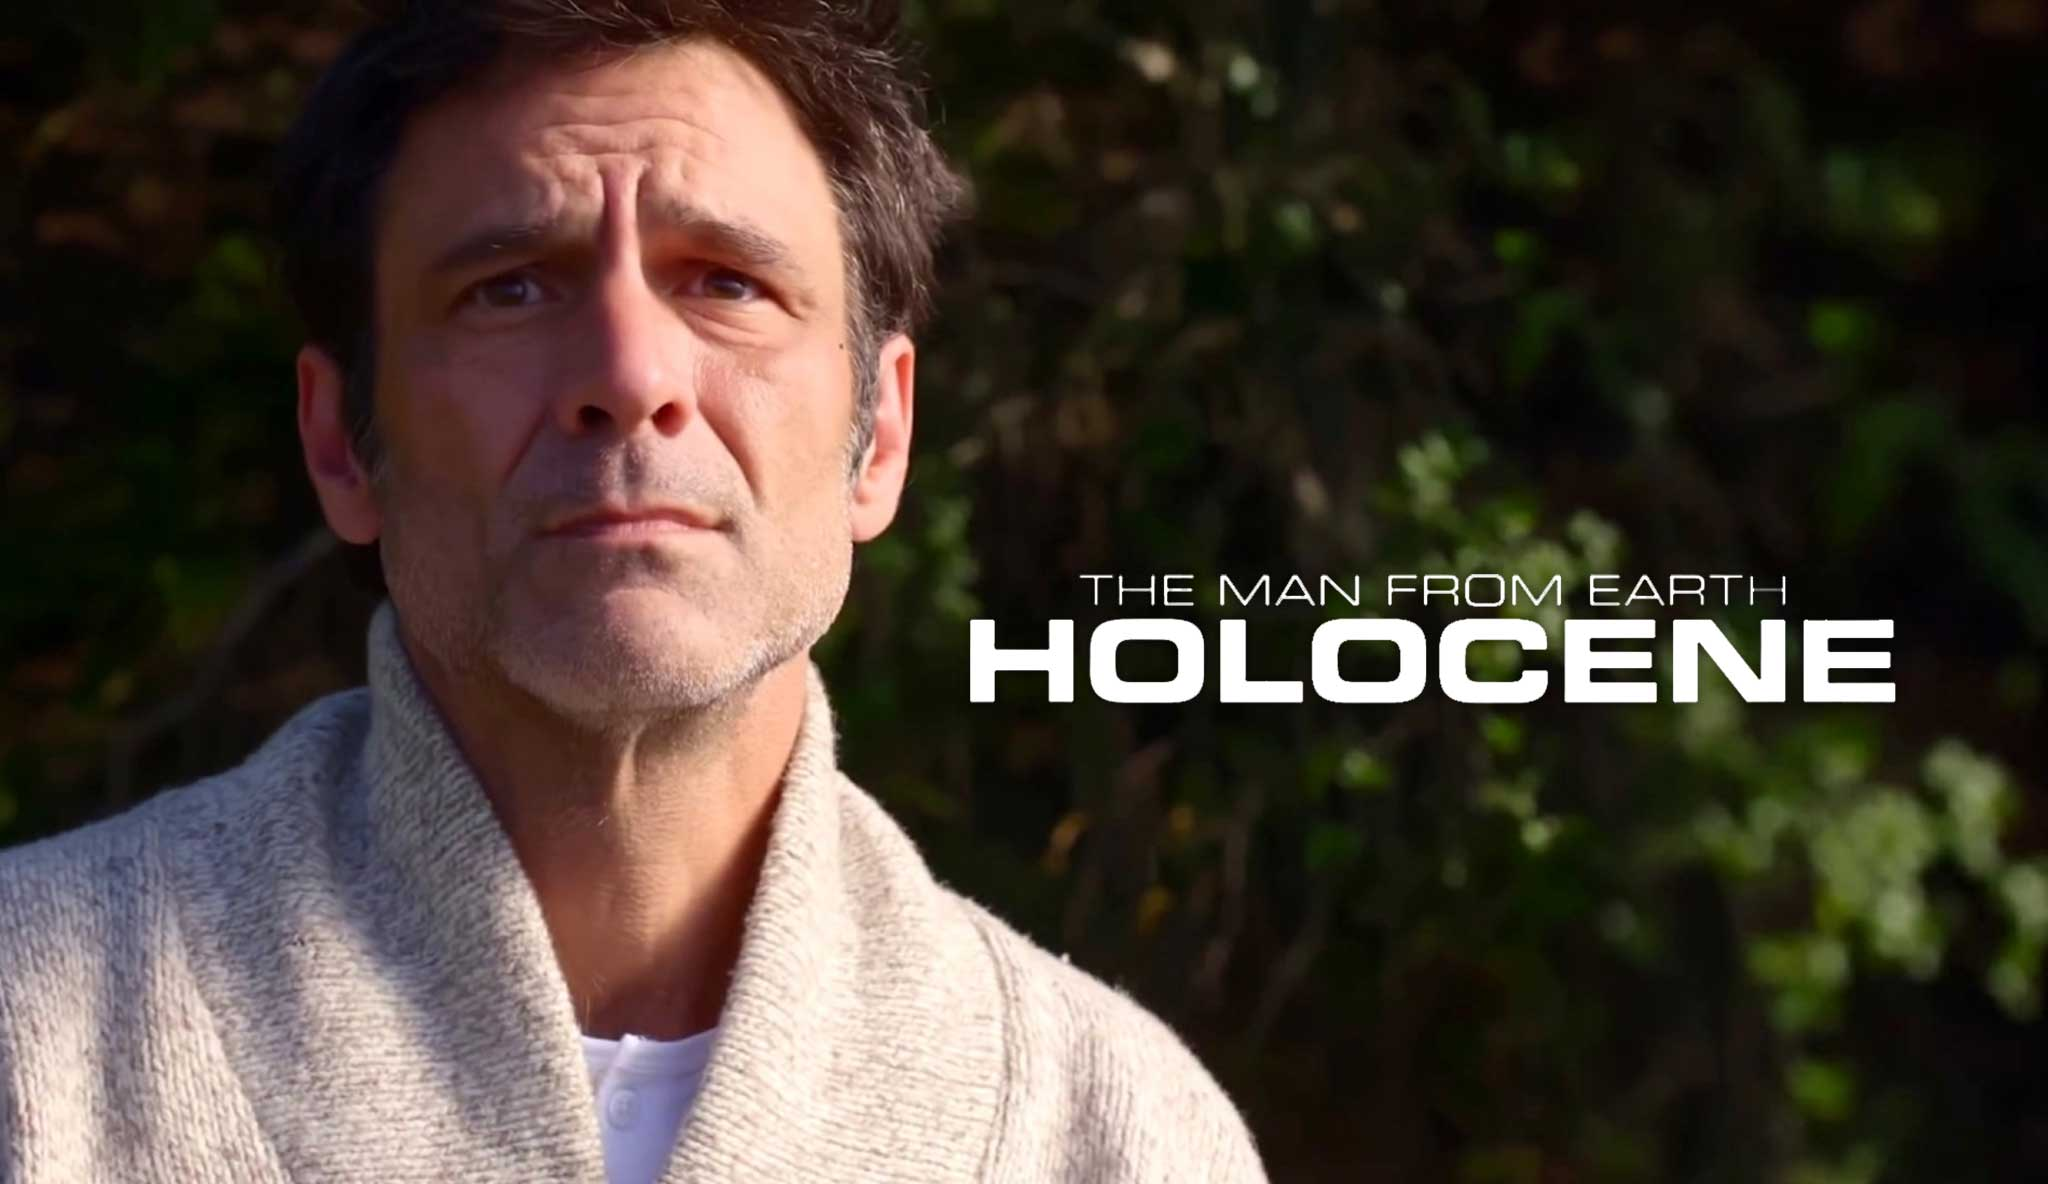 the-man-from-earth-holocene\header.jpg